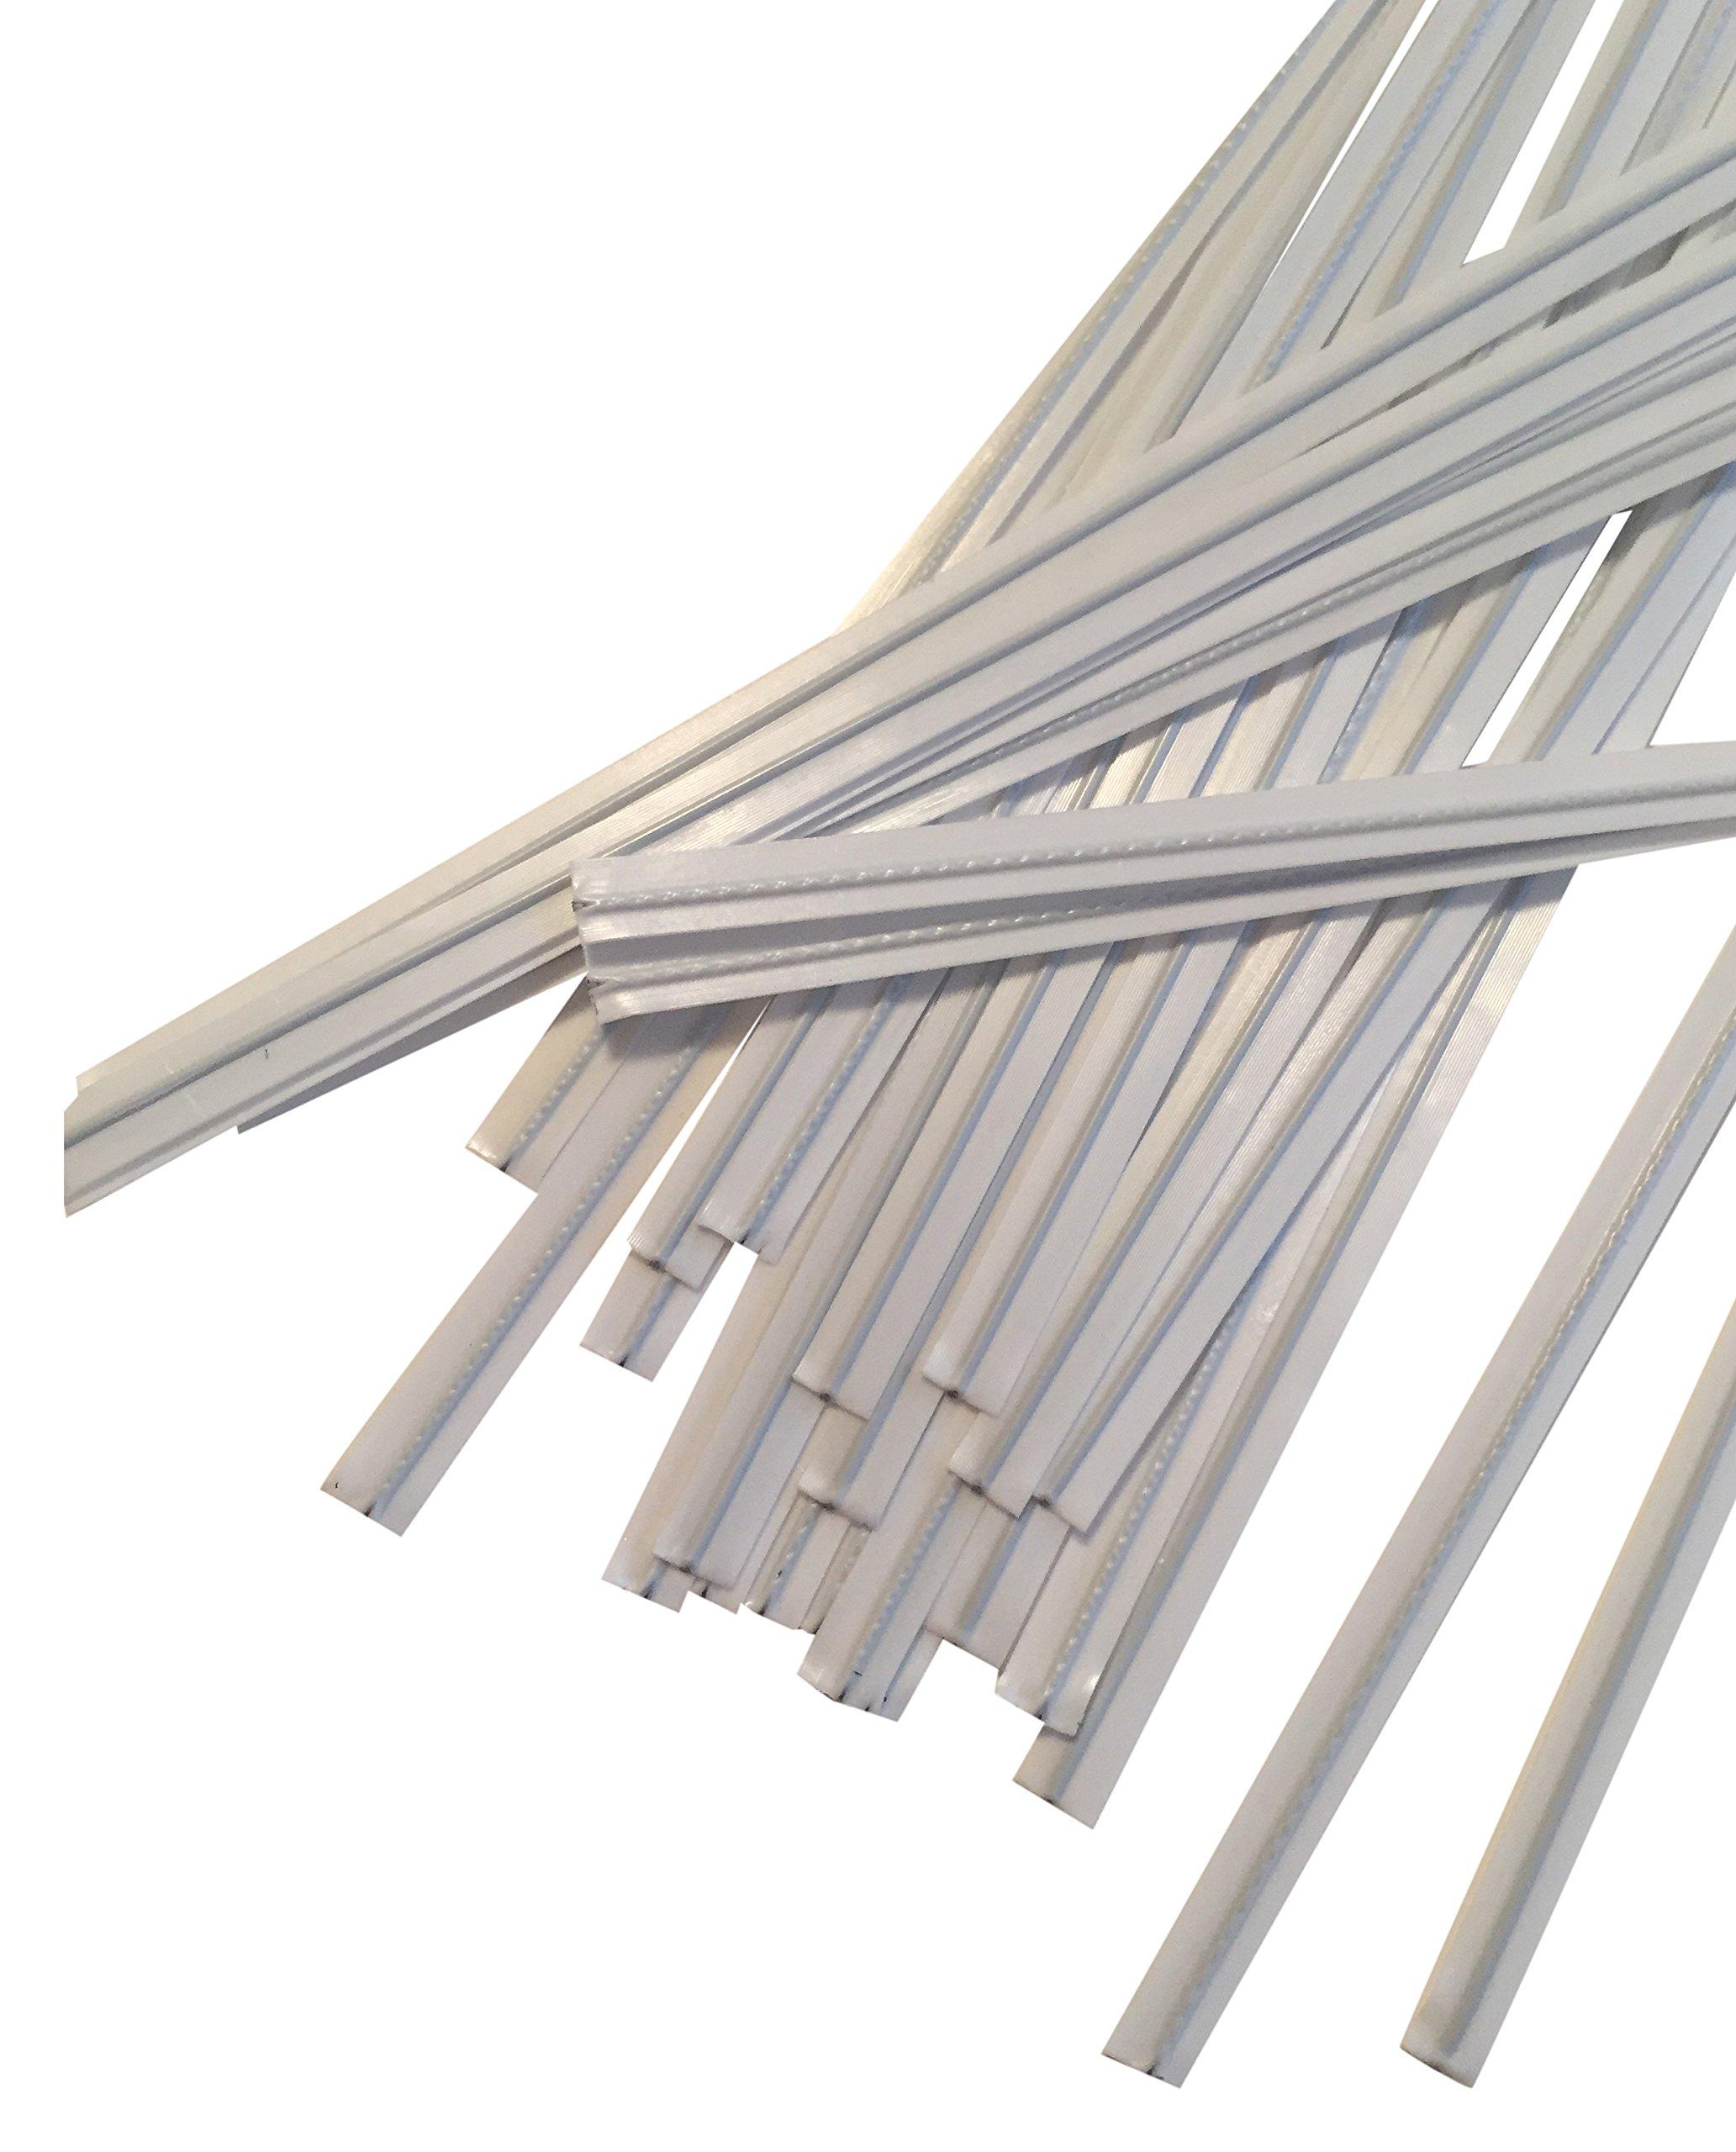 Duco Plastic Twist Ties Plastics and Supply, White, 4'' L x 5/32'' W, 2000 Piece